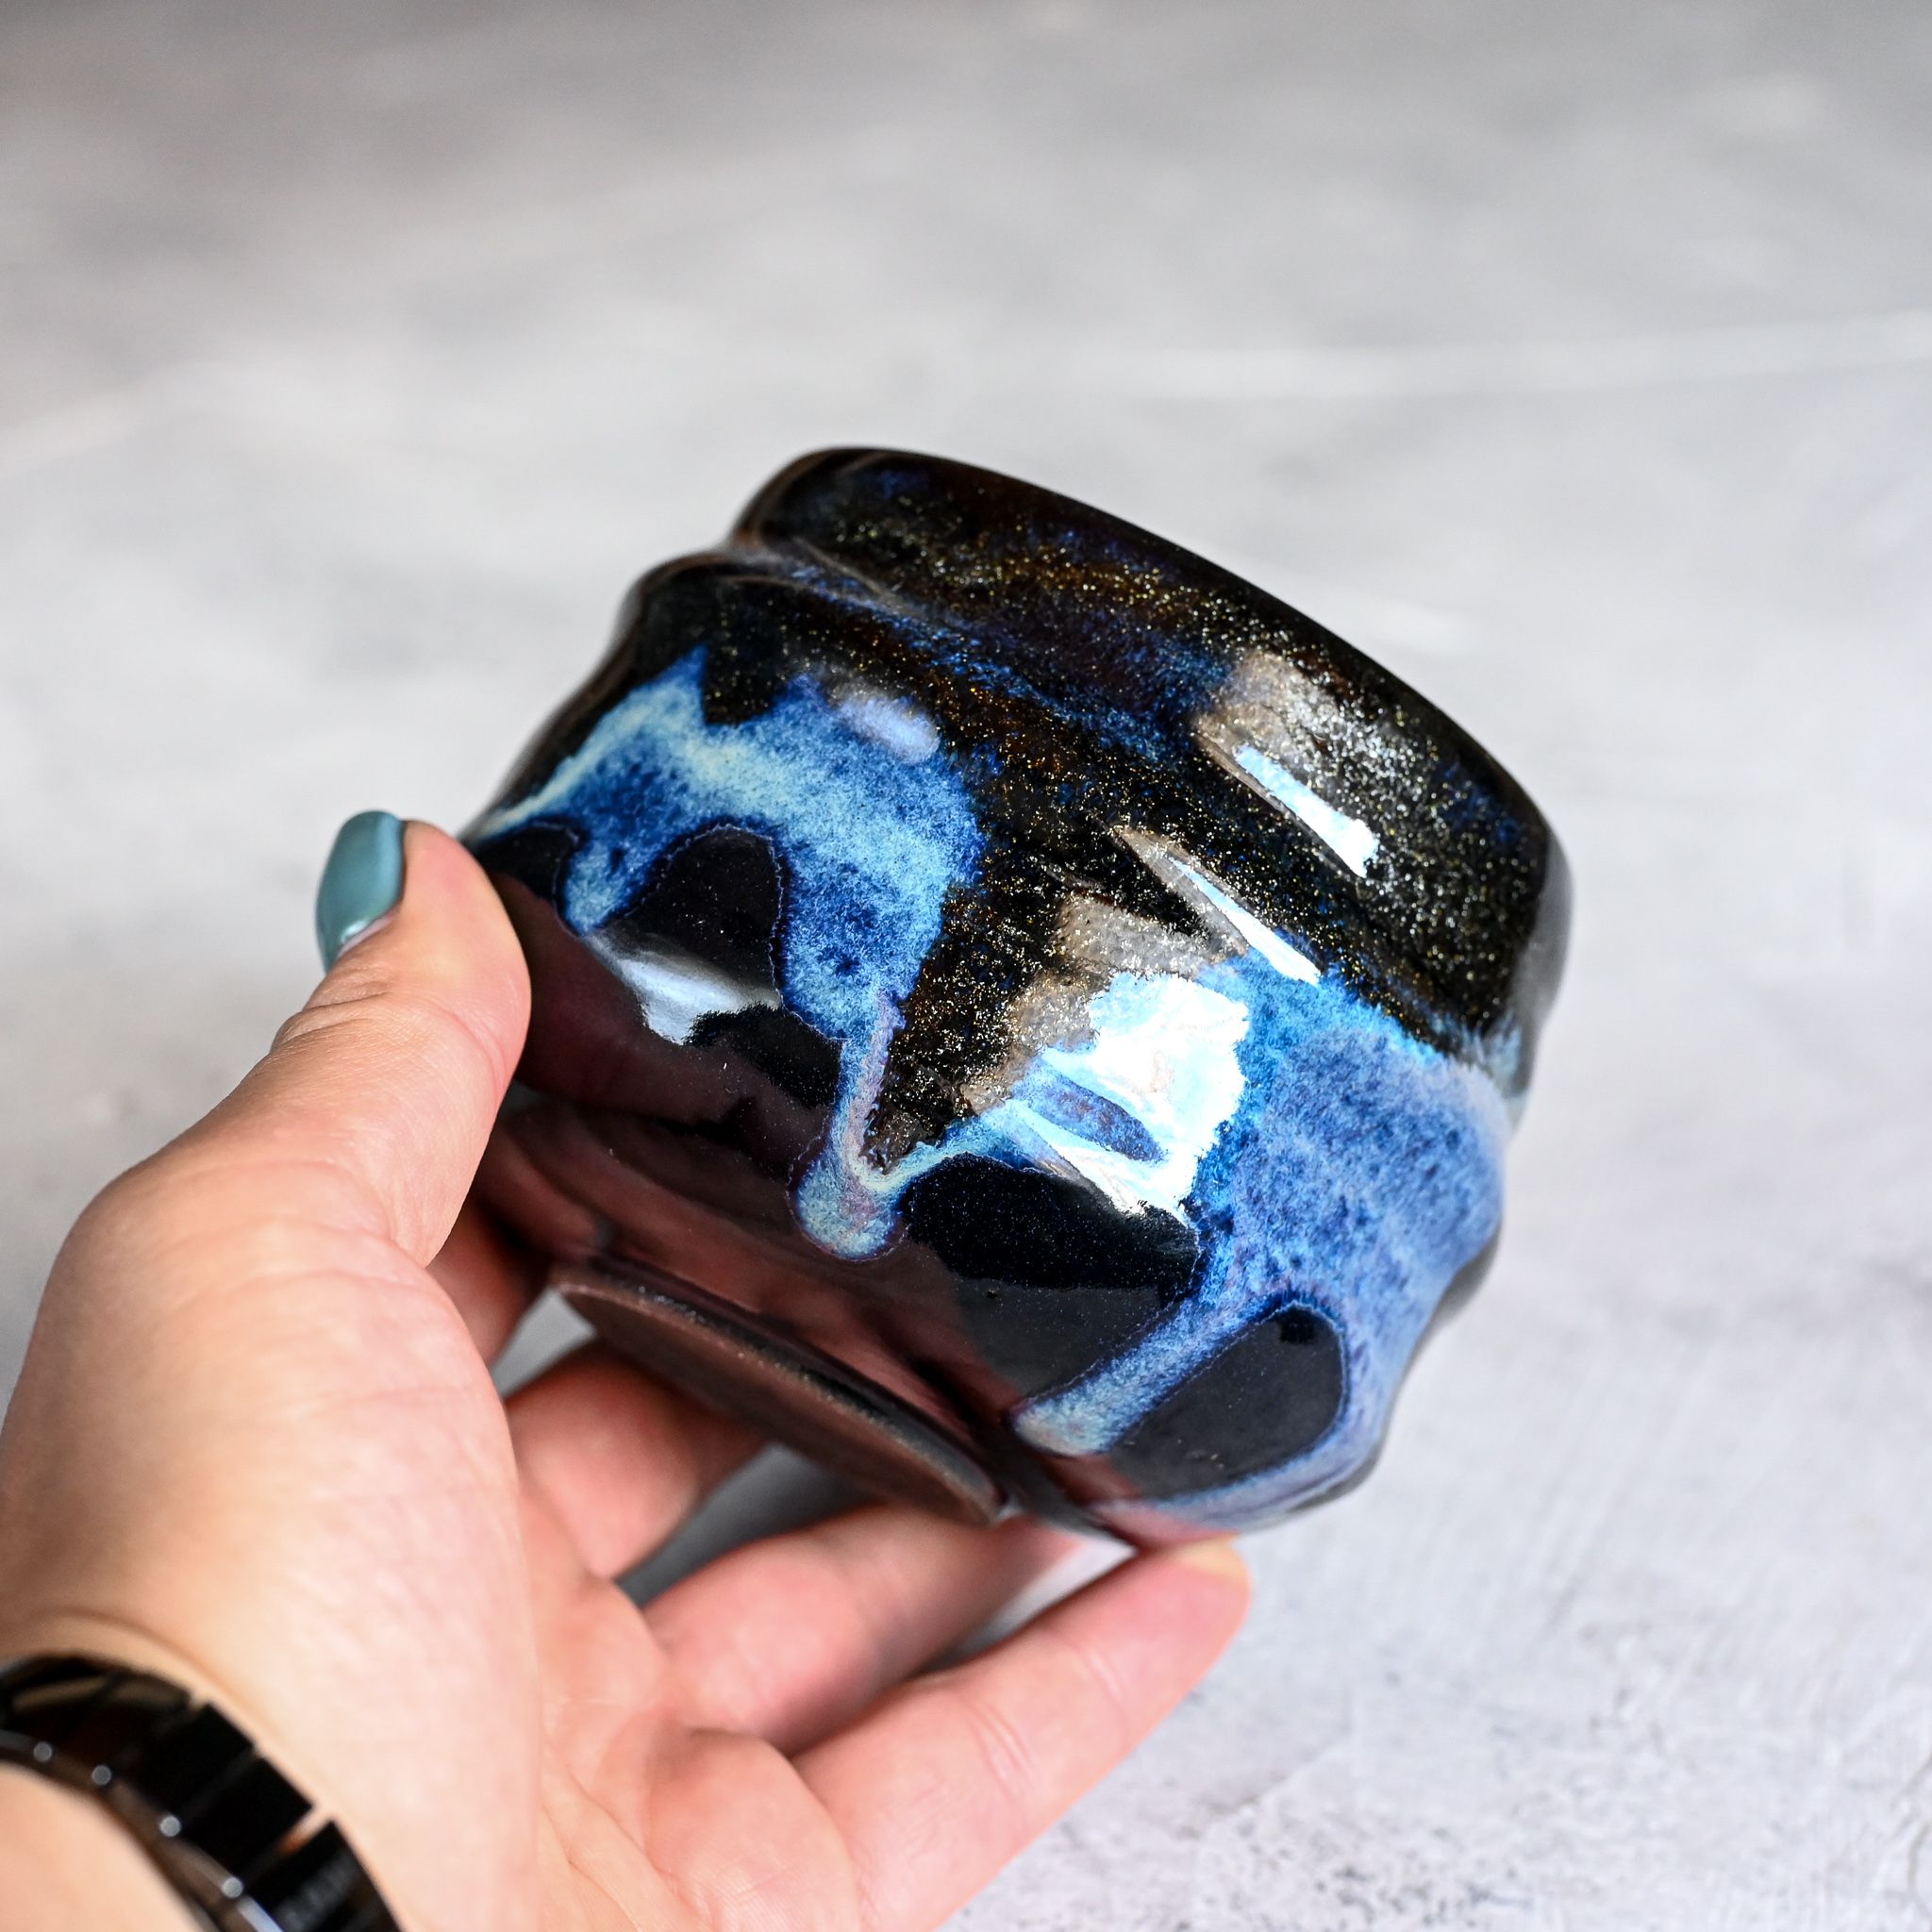 картинка Керамический стакан юноми Марии Левиной 13 - DishWishes.Ru